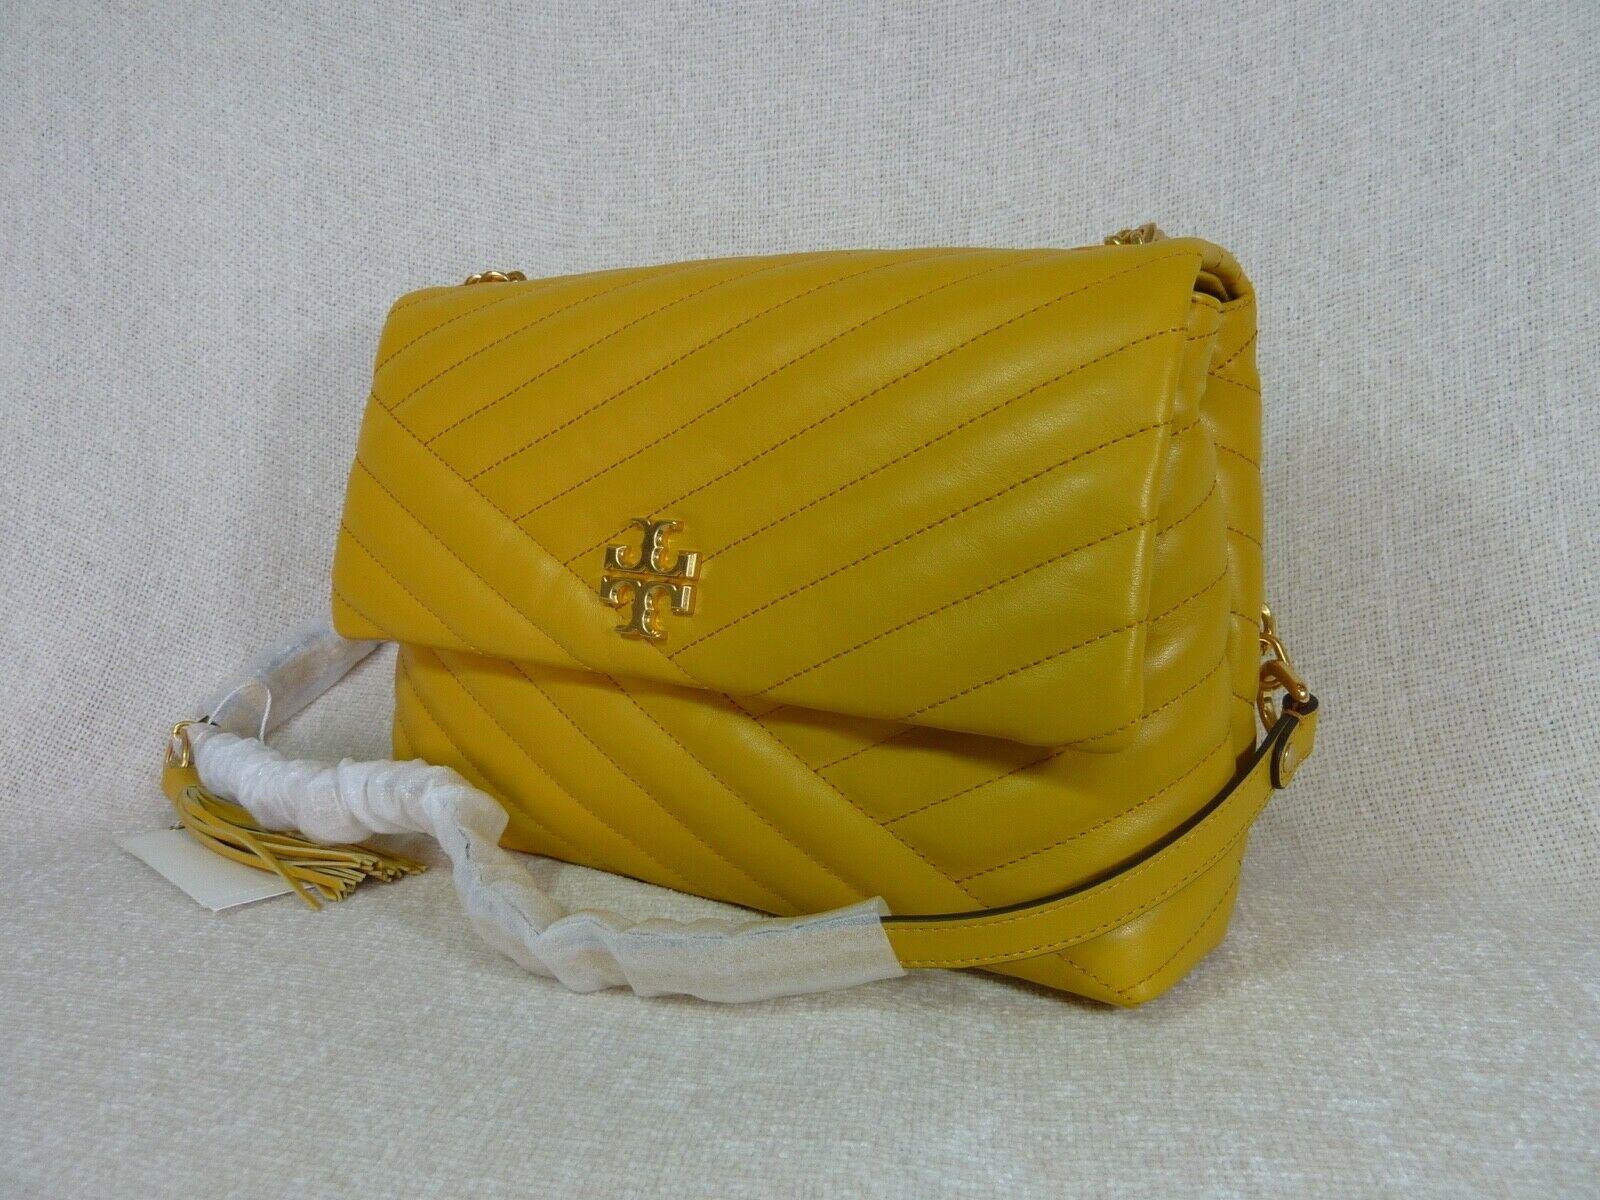 NWT Tory Burch Daylily Kira Chevron Flap Shoulder Bag $528 image 2